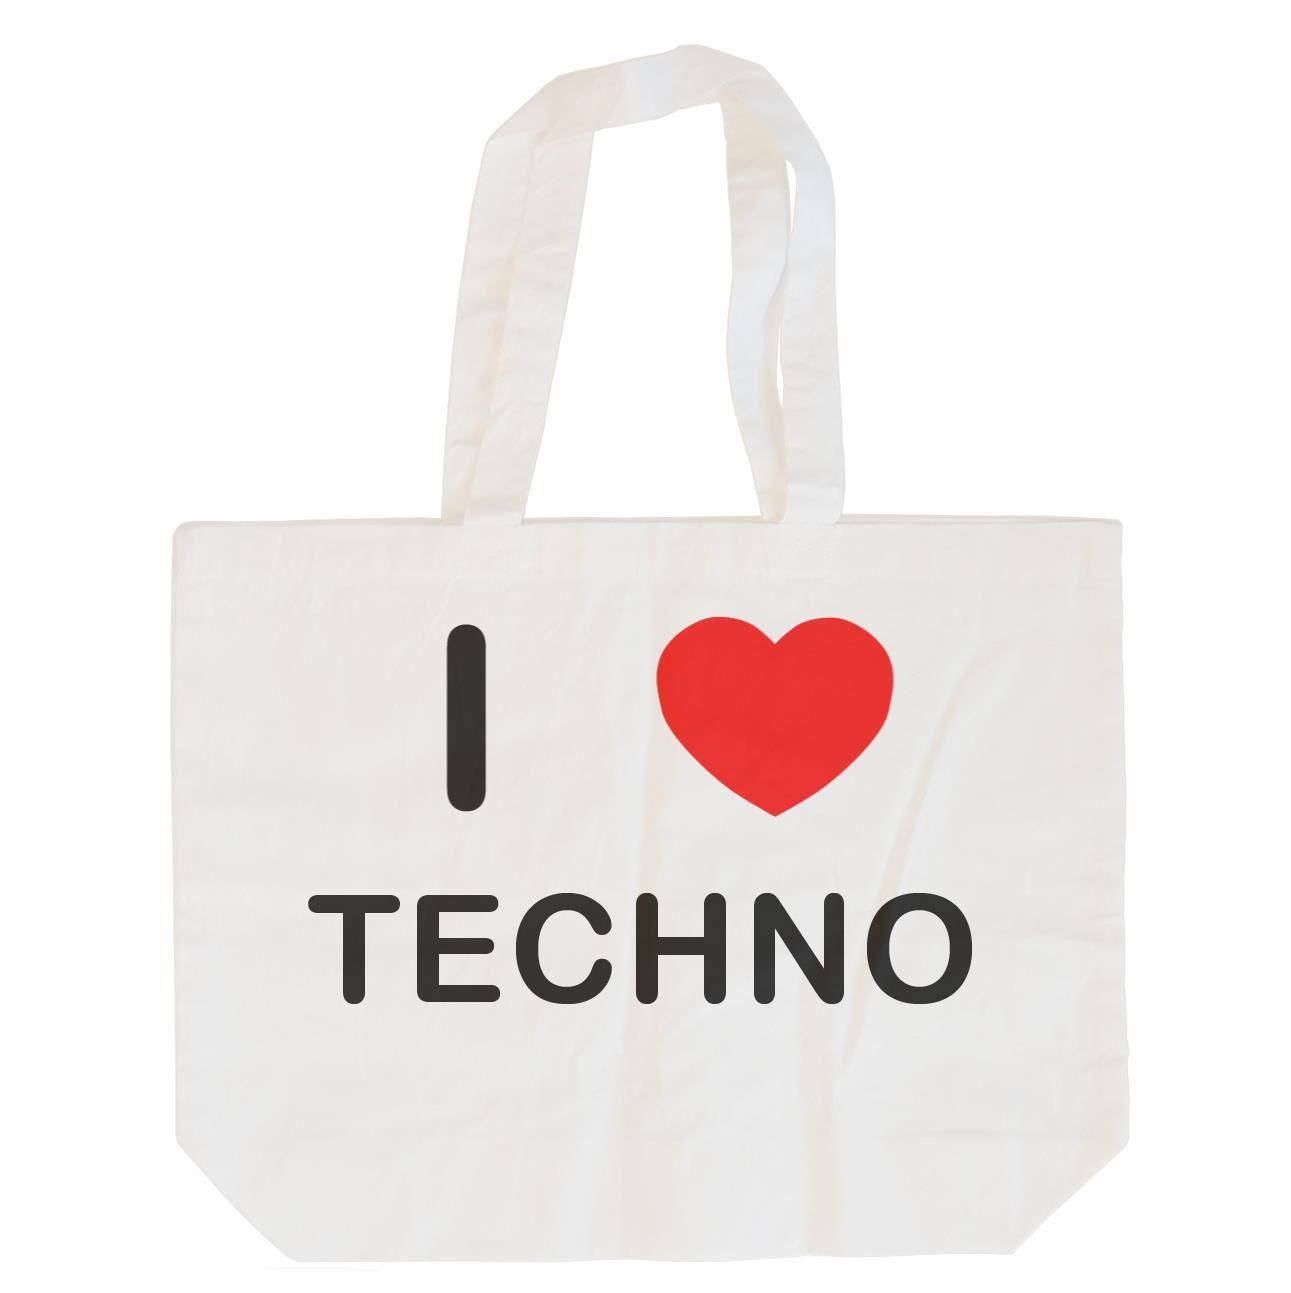 I Love Techno - Cotton Bag | Size choice Tote, Shopper or Sling